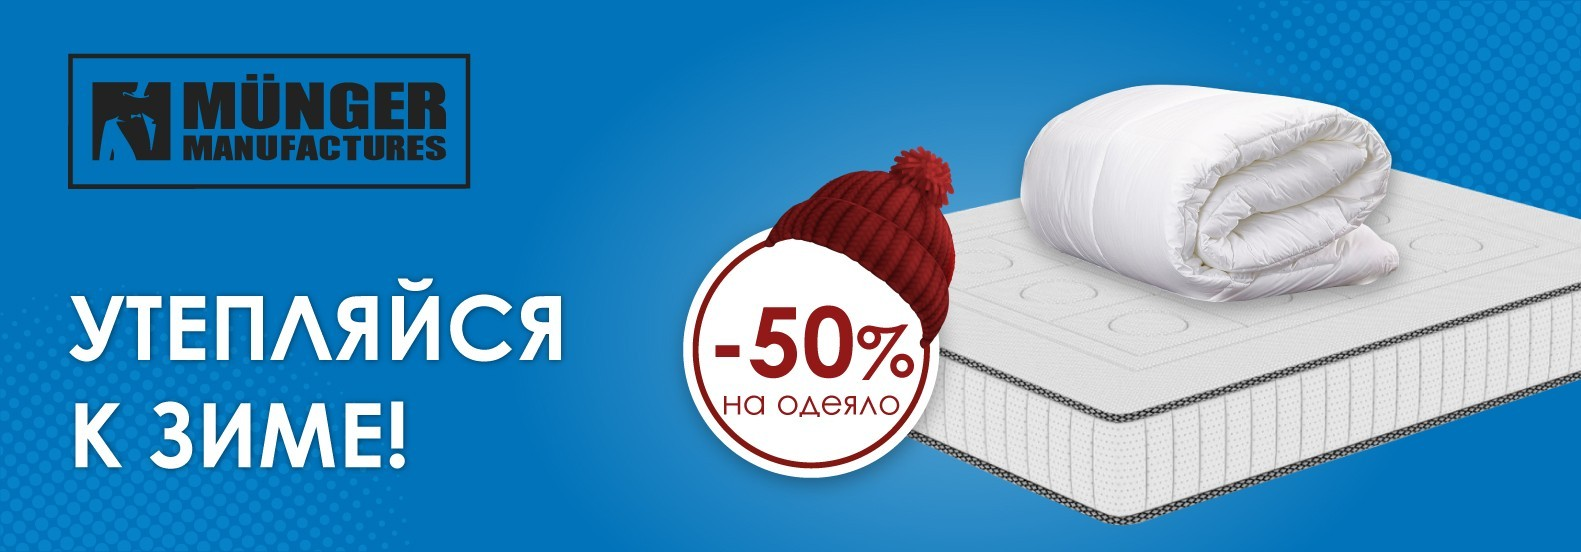 Утепляйся к зиме: -50% на одеяло